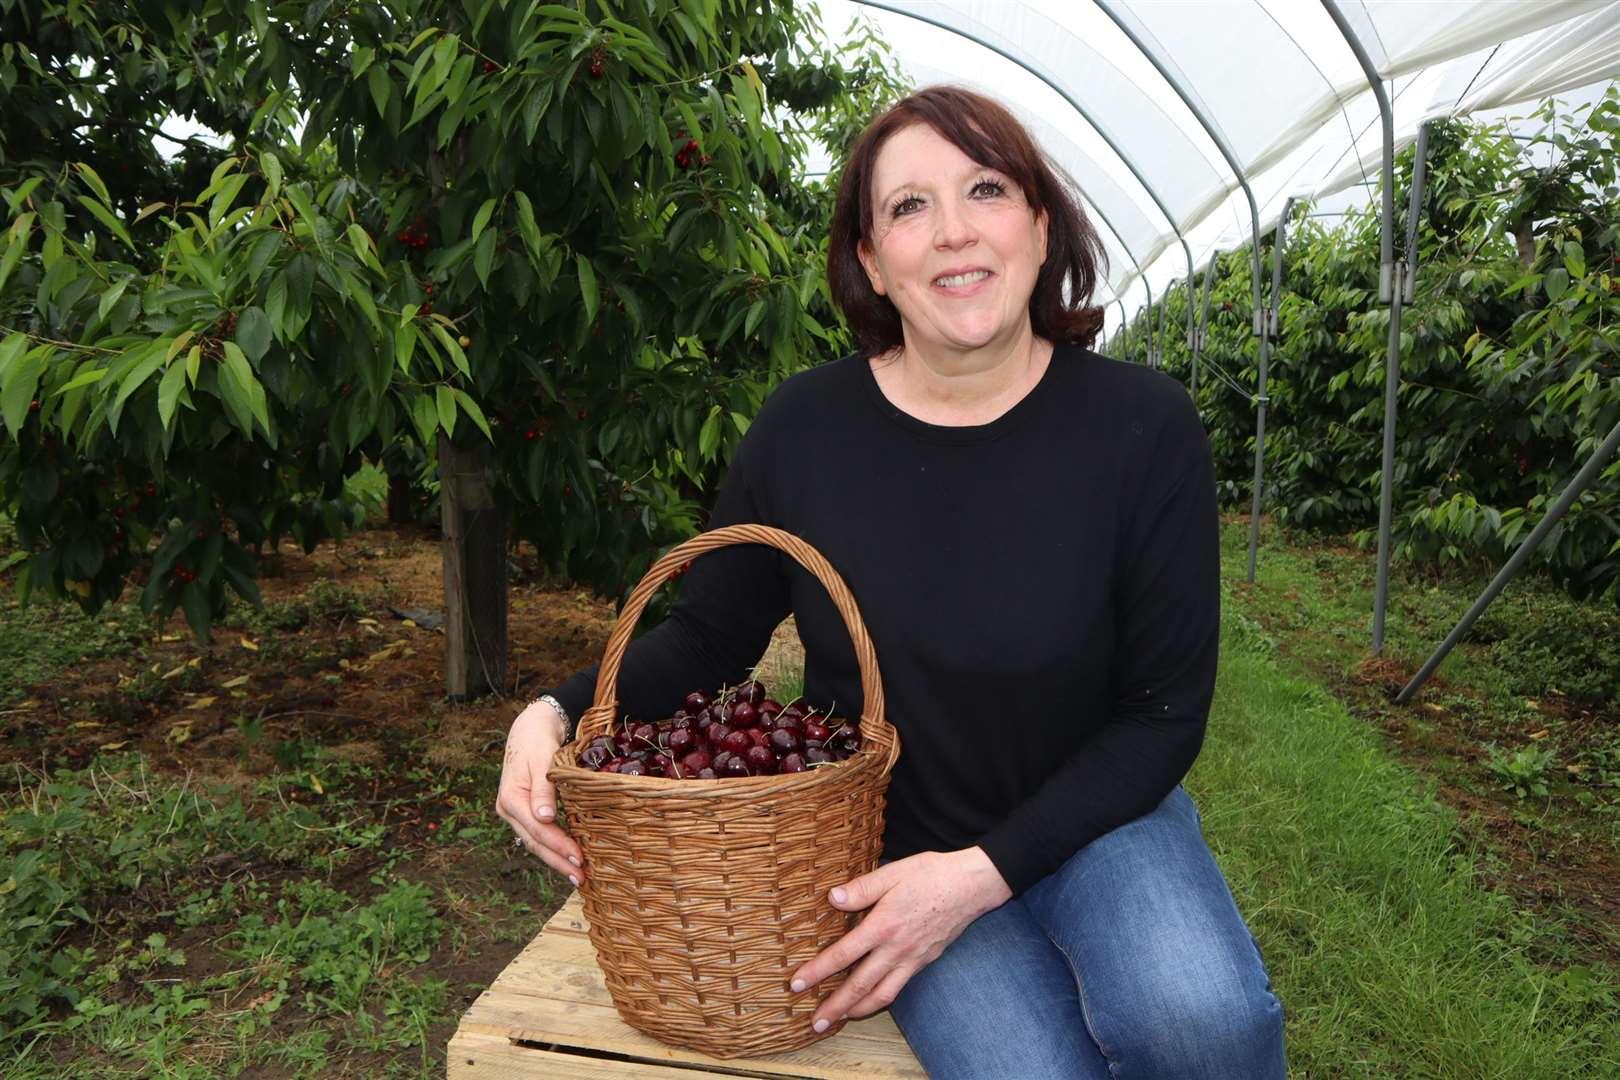 Sarah Neaves, cherry grower from Sittingbourne, at Little Sharsted Farm.  Photo: John Nurden